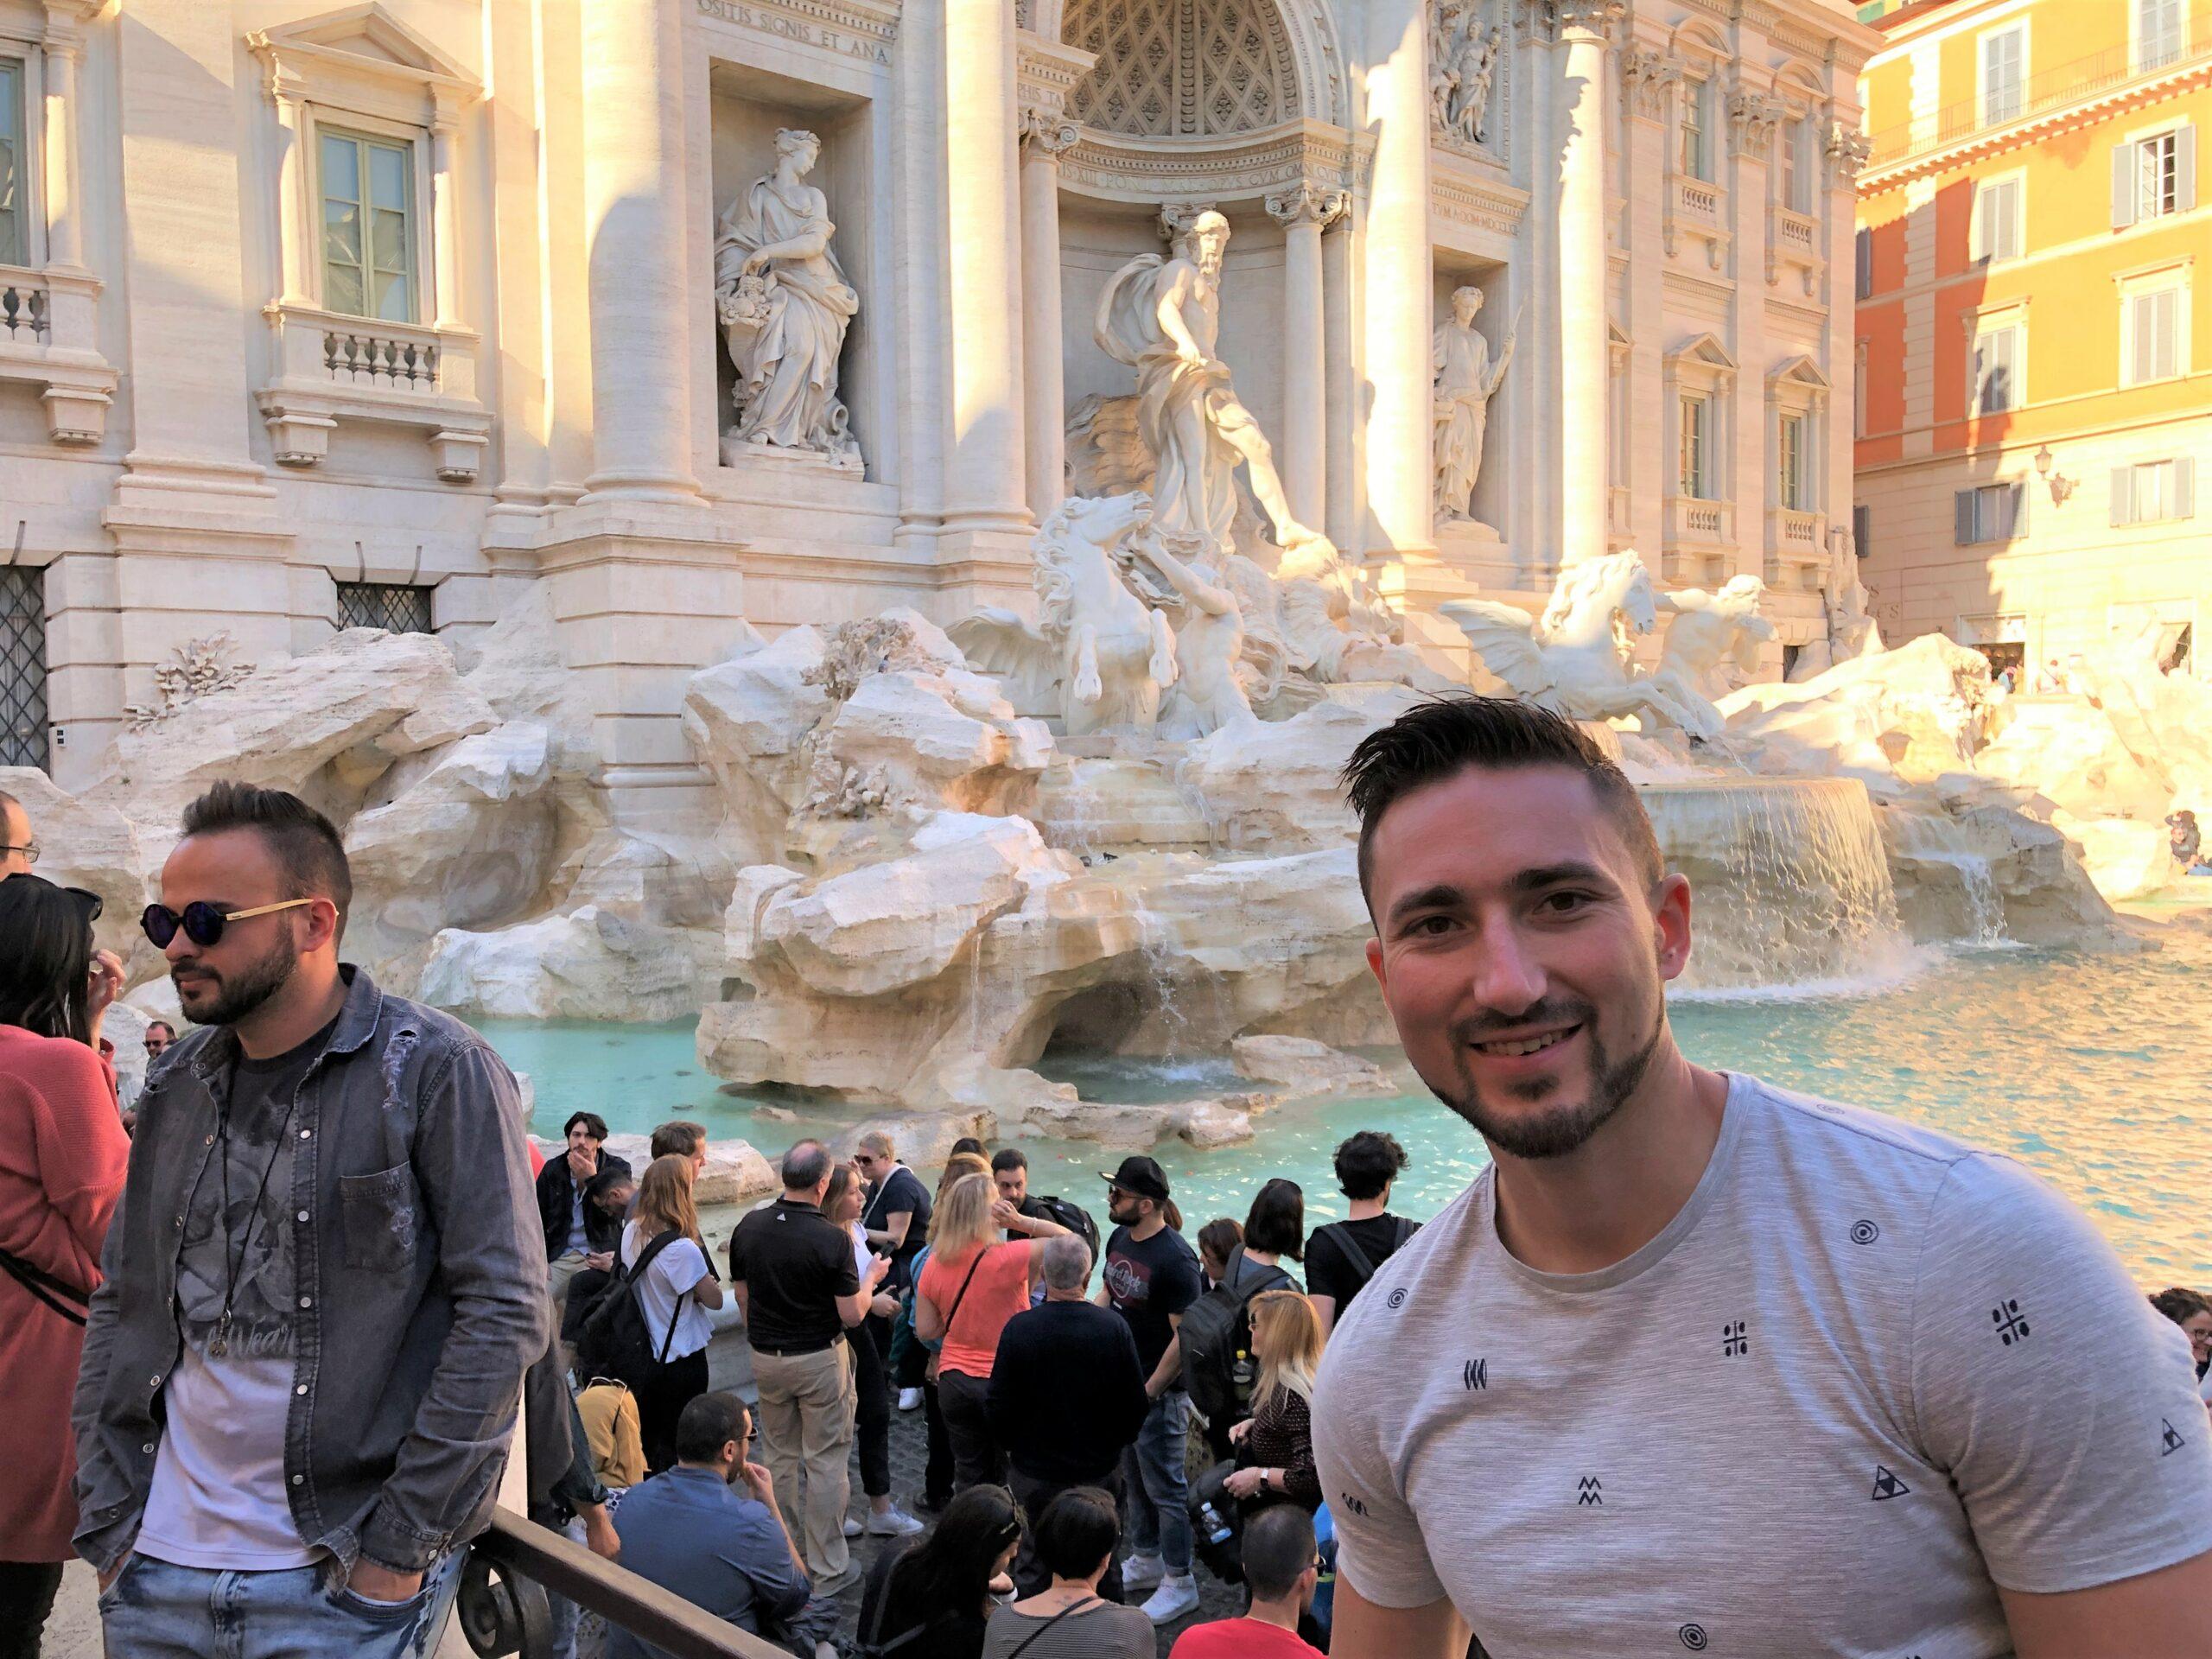 Overtoerisme in Italië - Rome - Trevi fontein